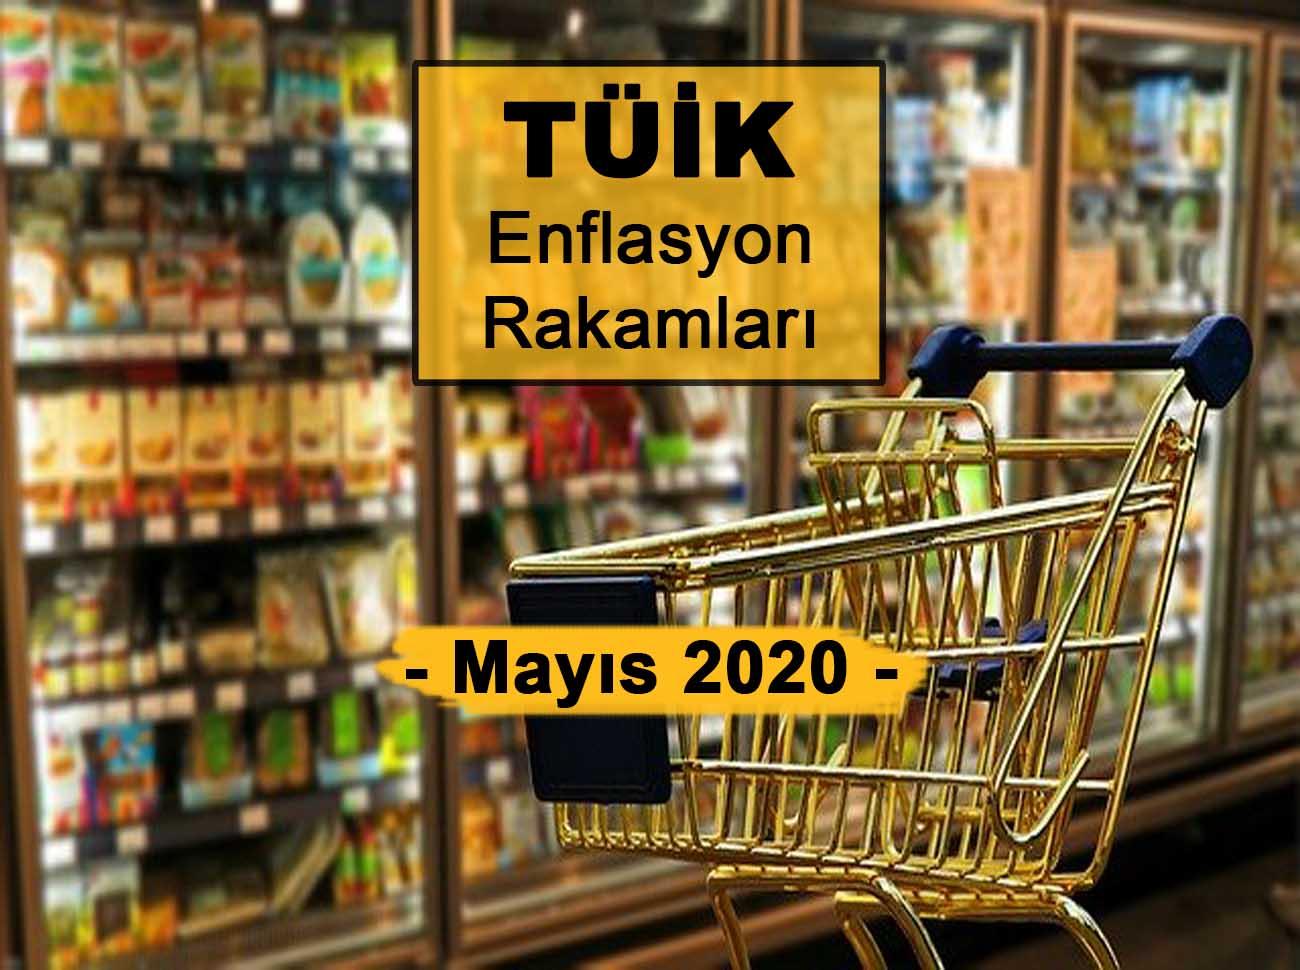 Enflasyon Rakamları Mayıs 2020